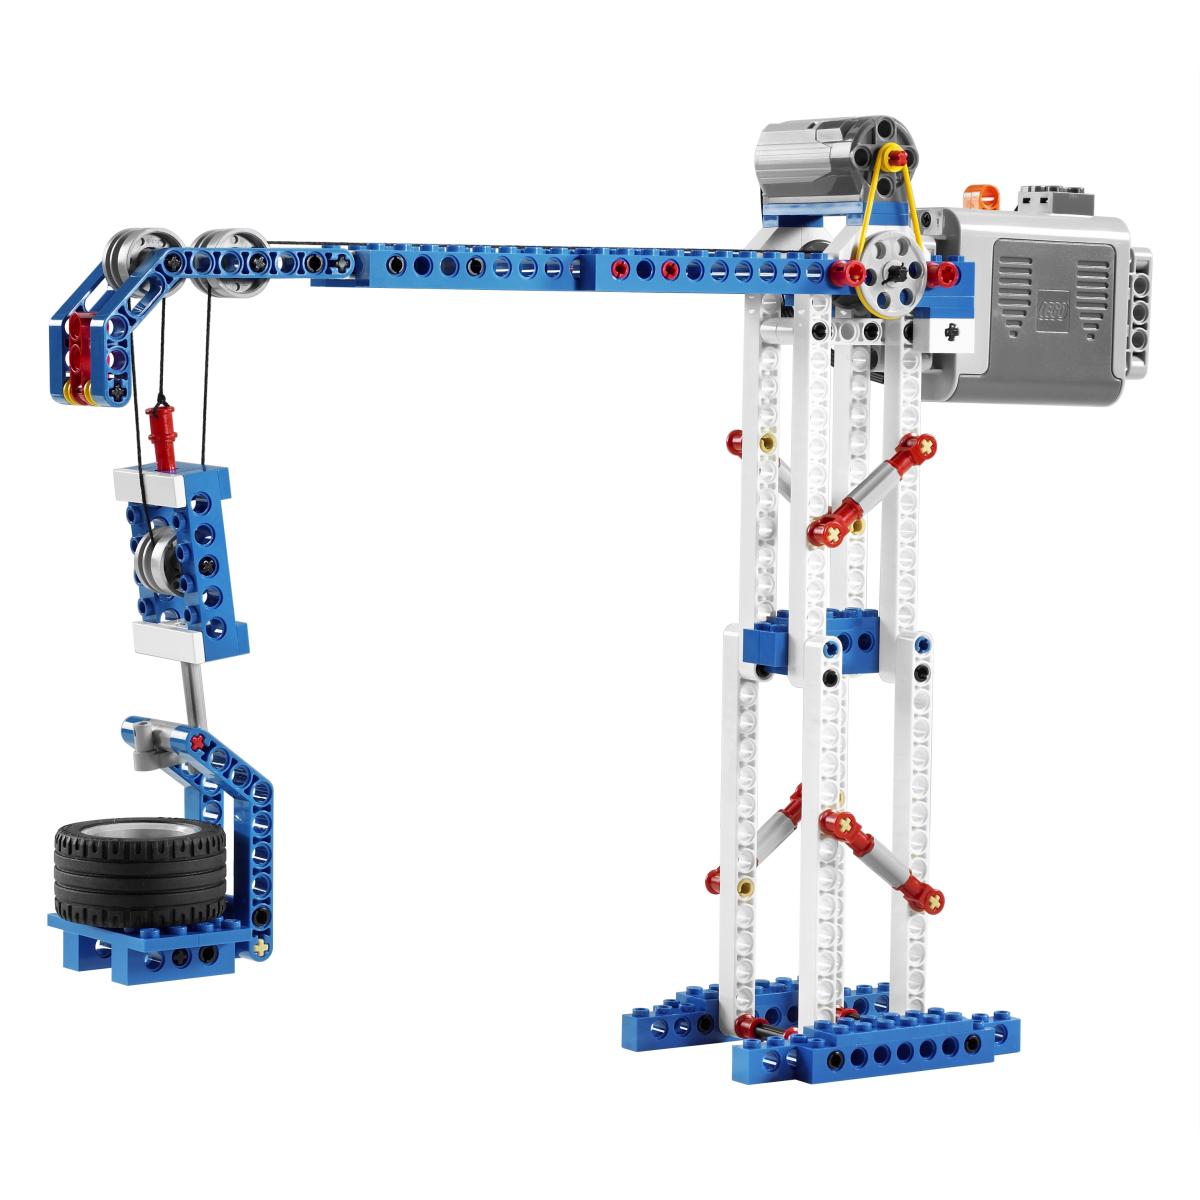 Lego Education Simple Amp Powered Machines Set